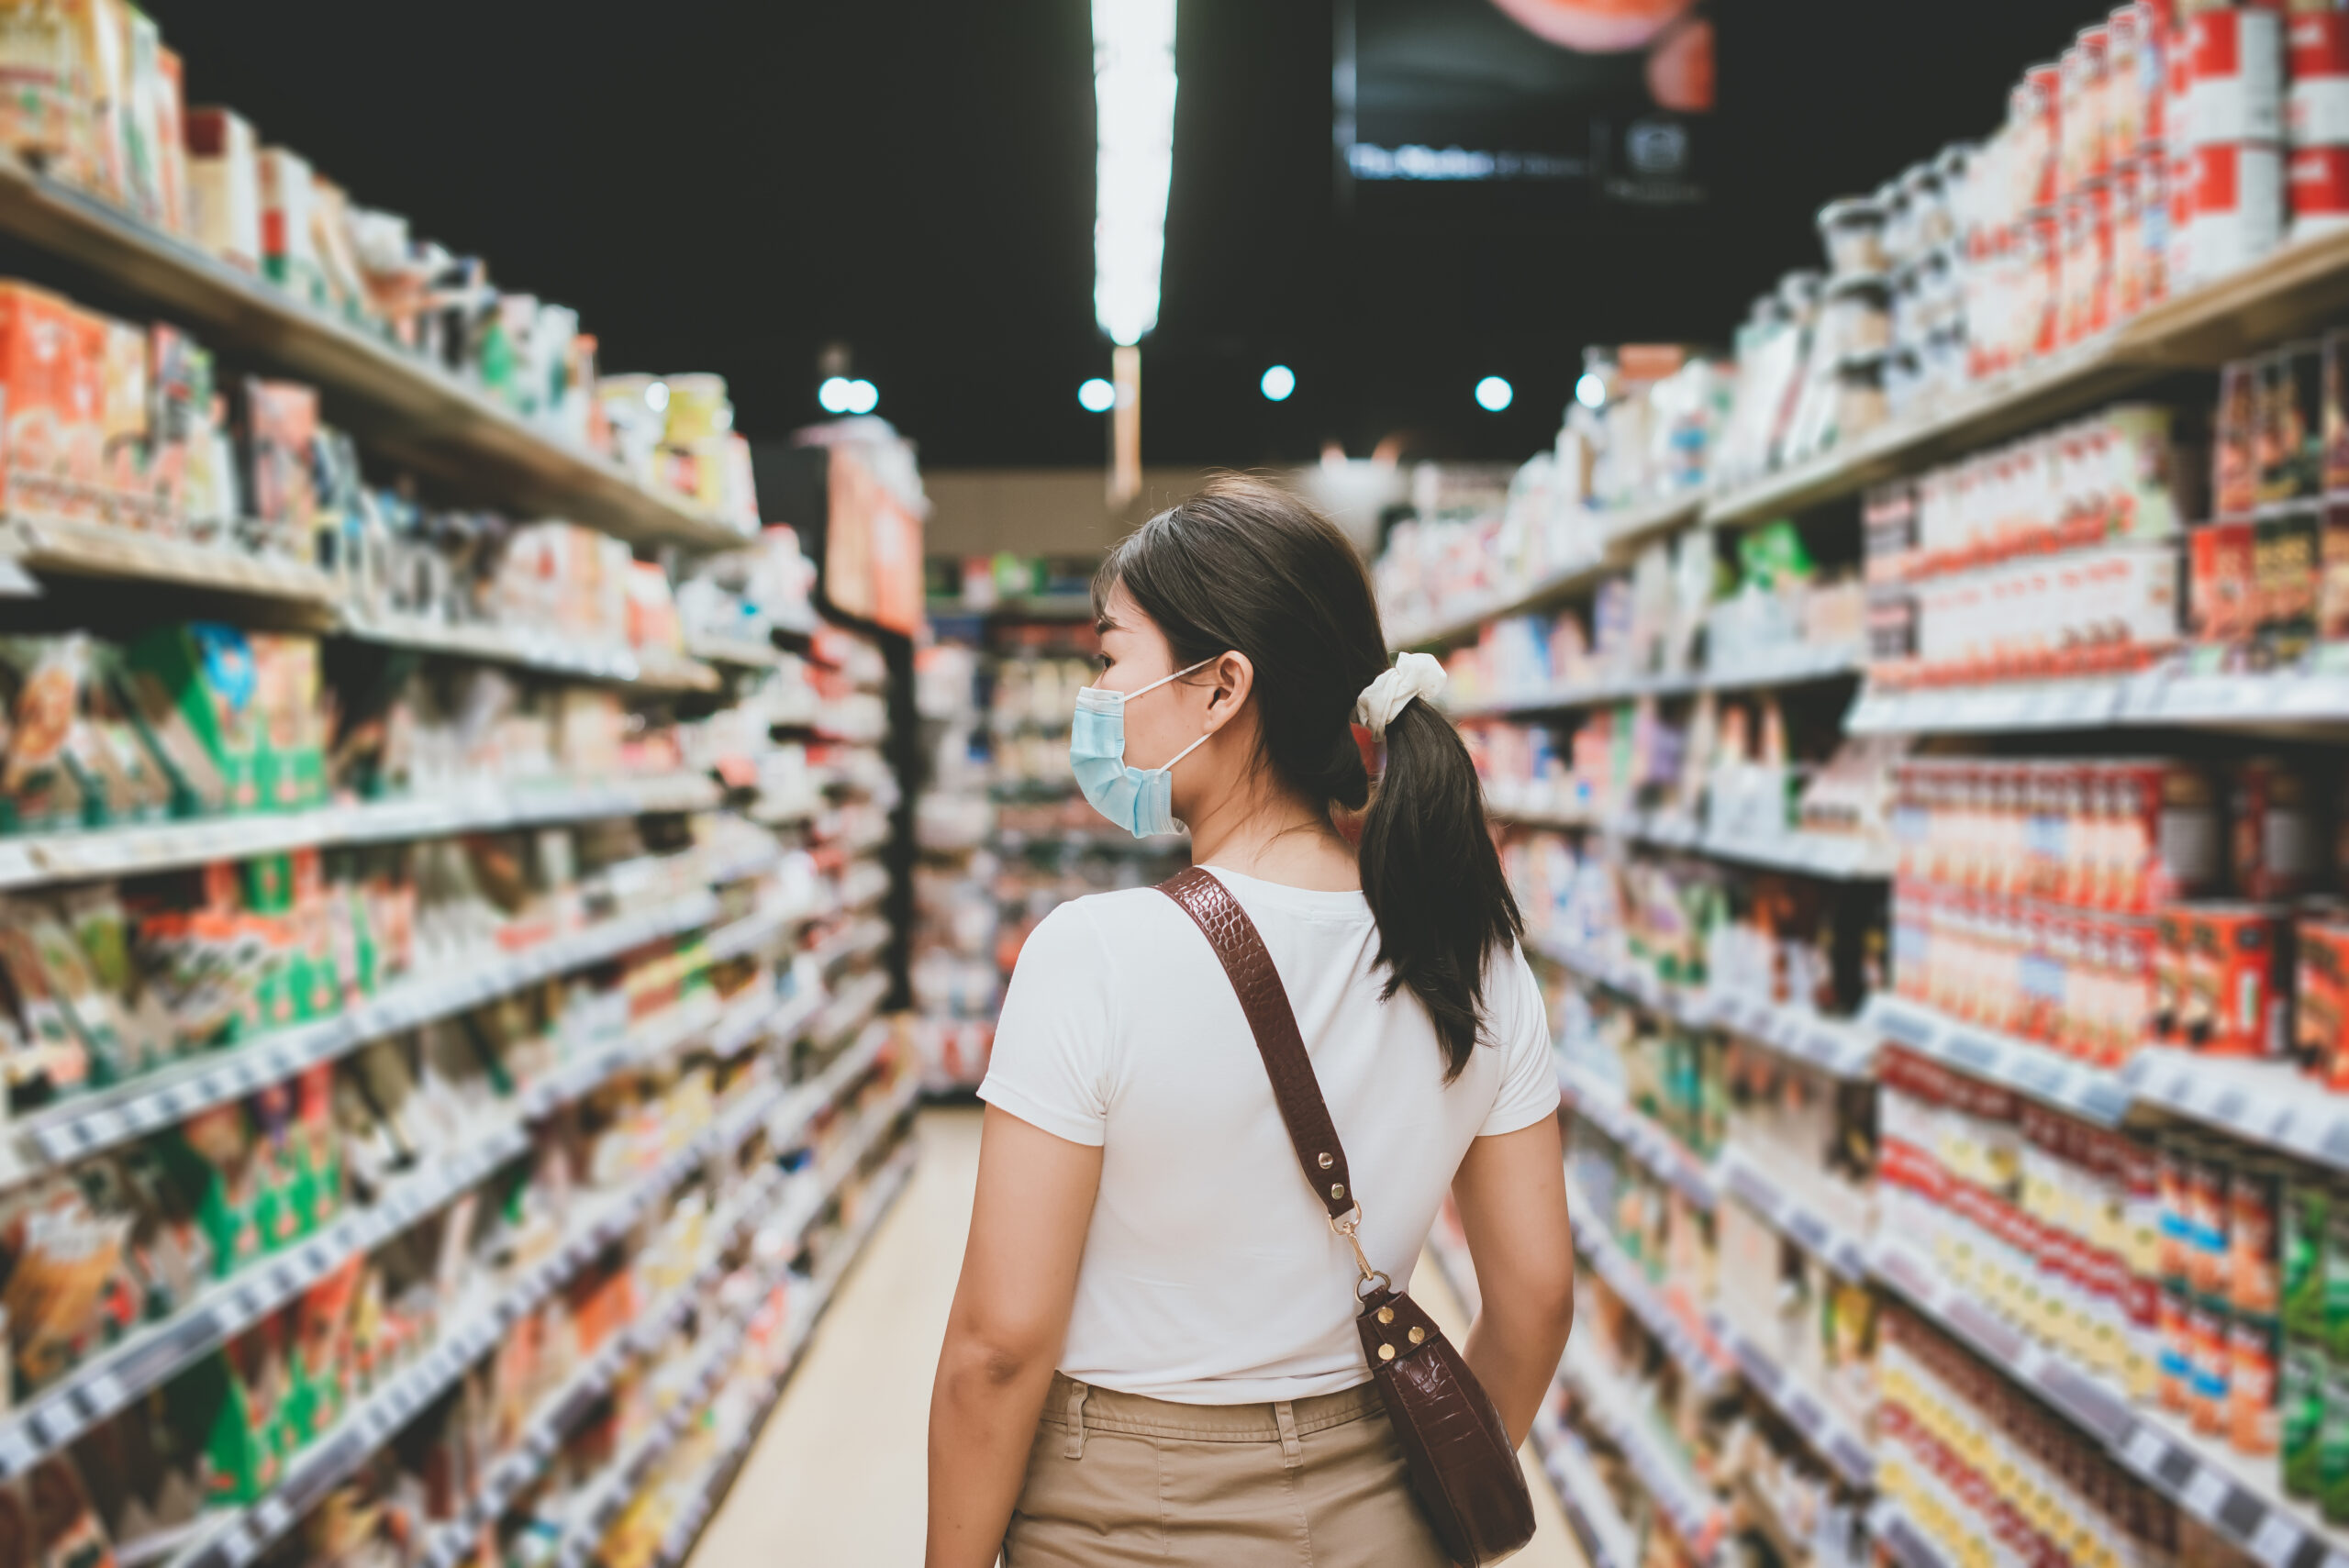 Enviro_consumer trend